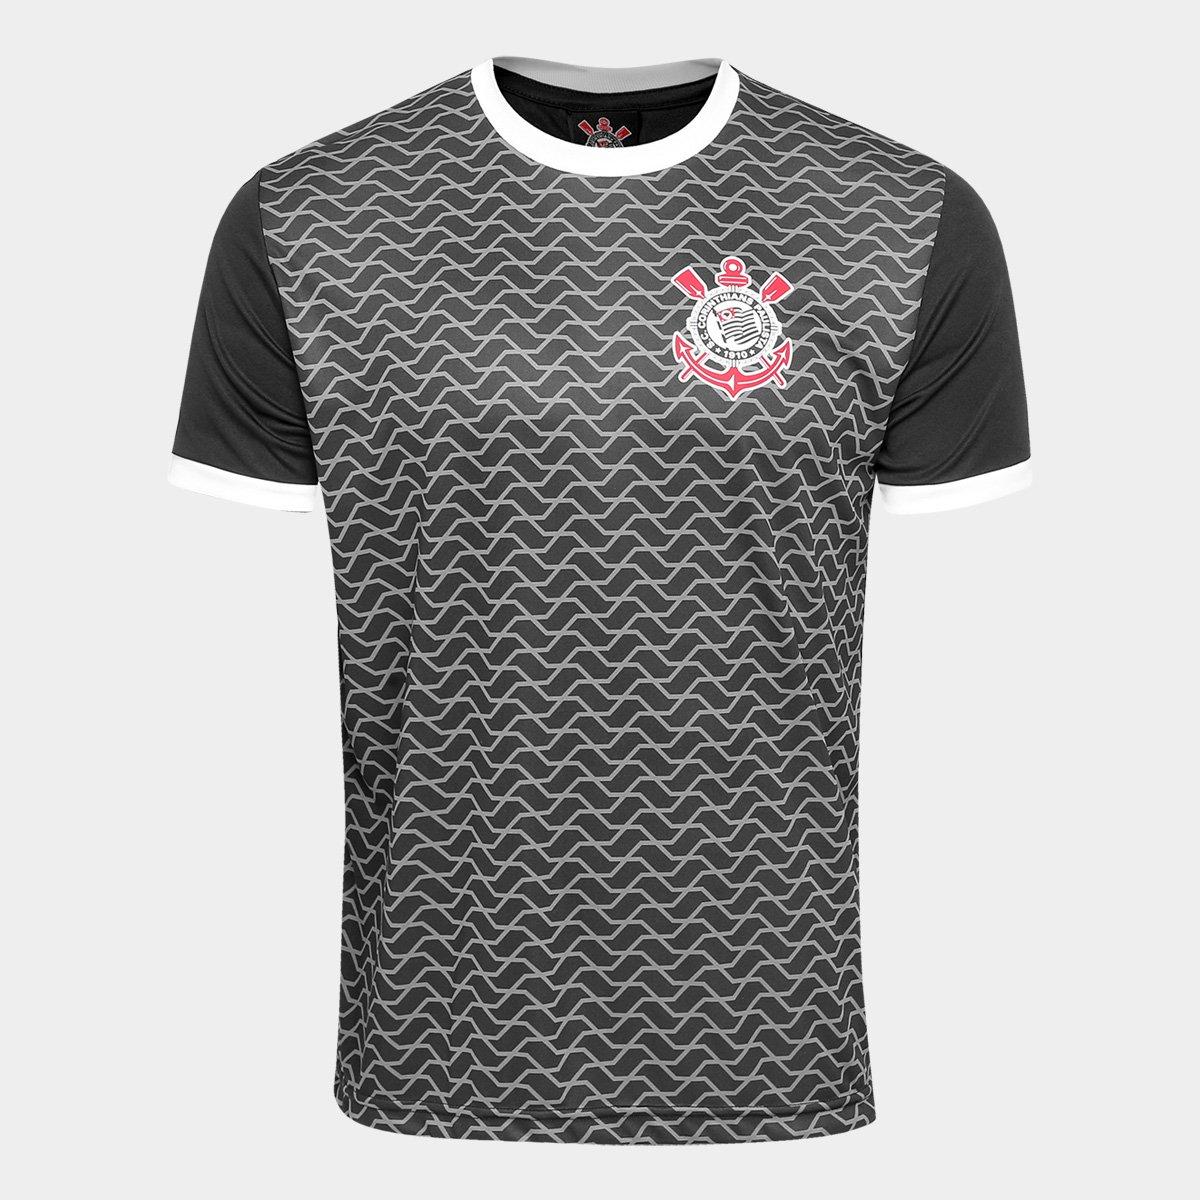 Camisa Corinthians Libertados Masculina - Preto - Compre Agora ... 66e1b7328cd11